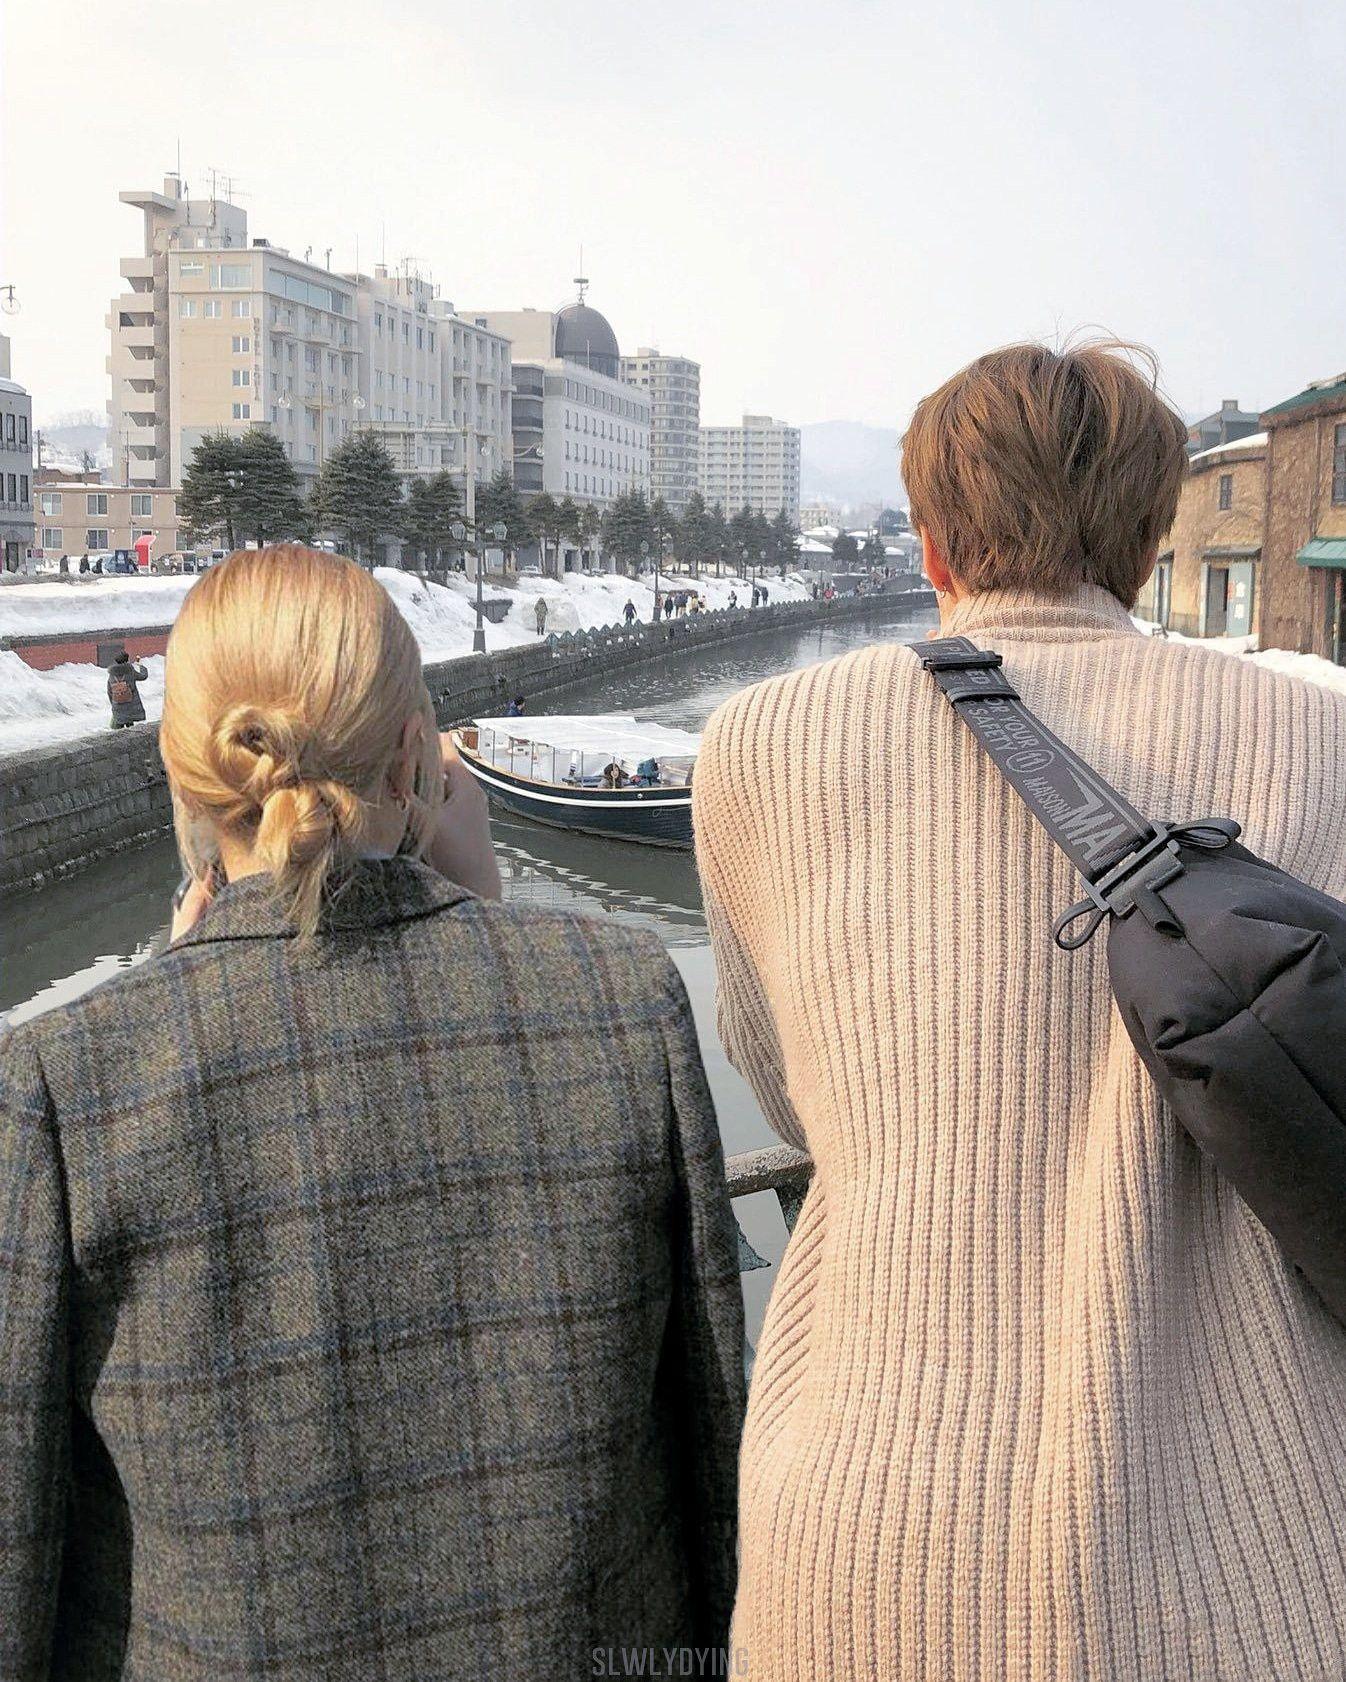 Johnny Yeri Foto Teman Fotografi Pasangan Romantis Selebritas